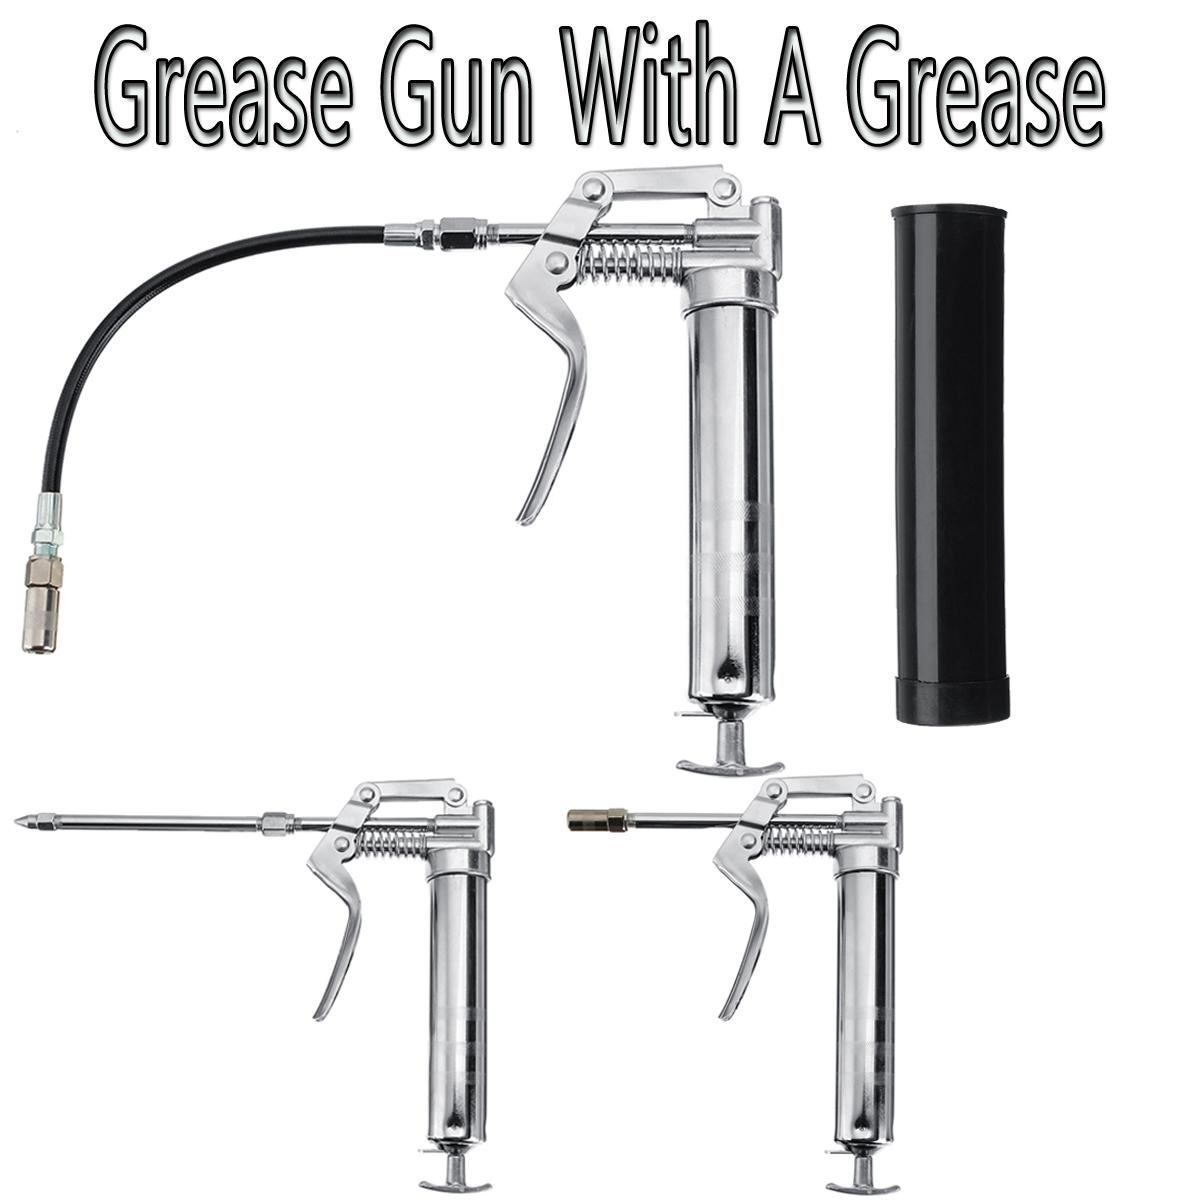 120cc professional pistol grip grease gun pistol grip tool